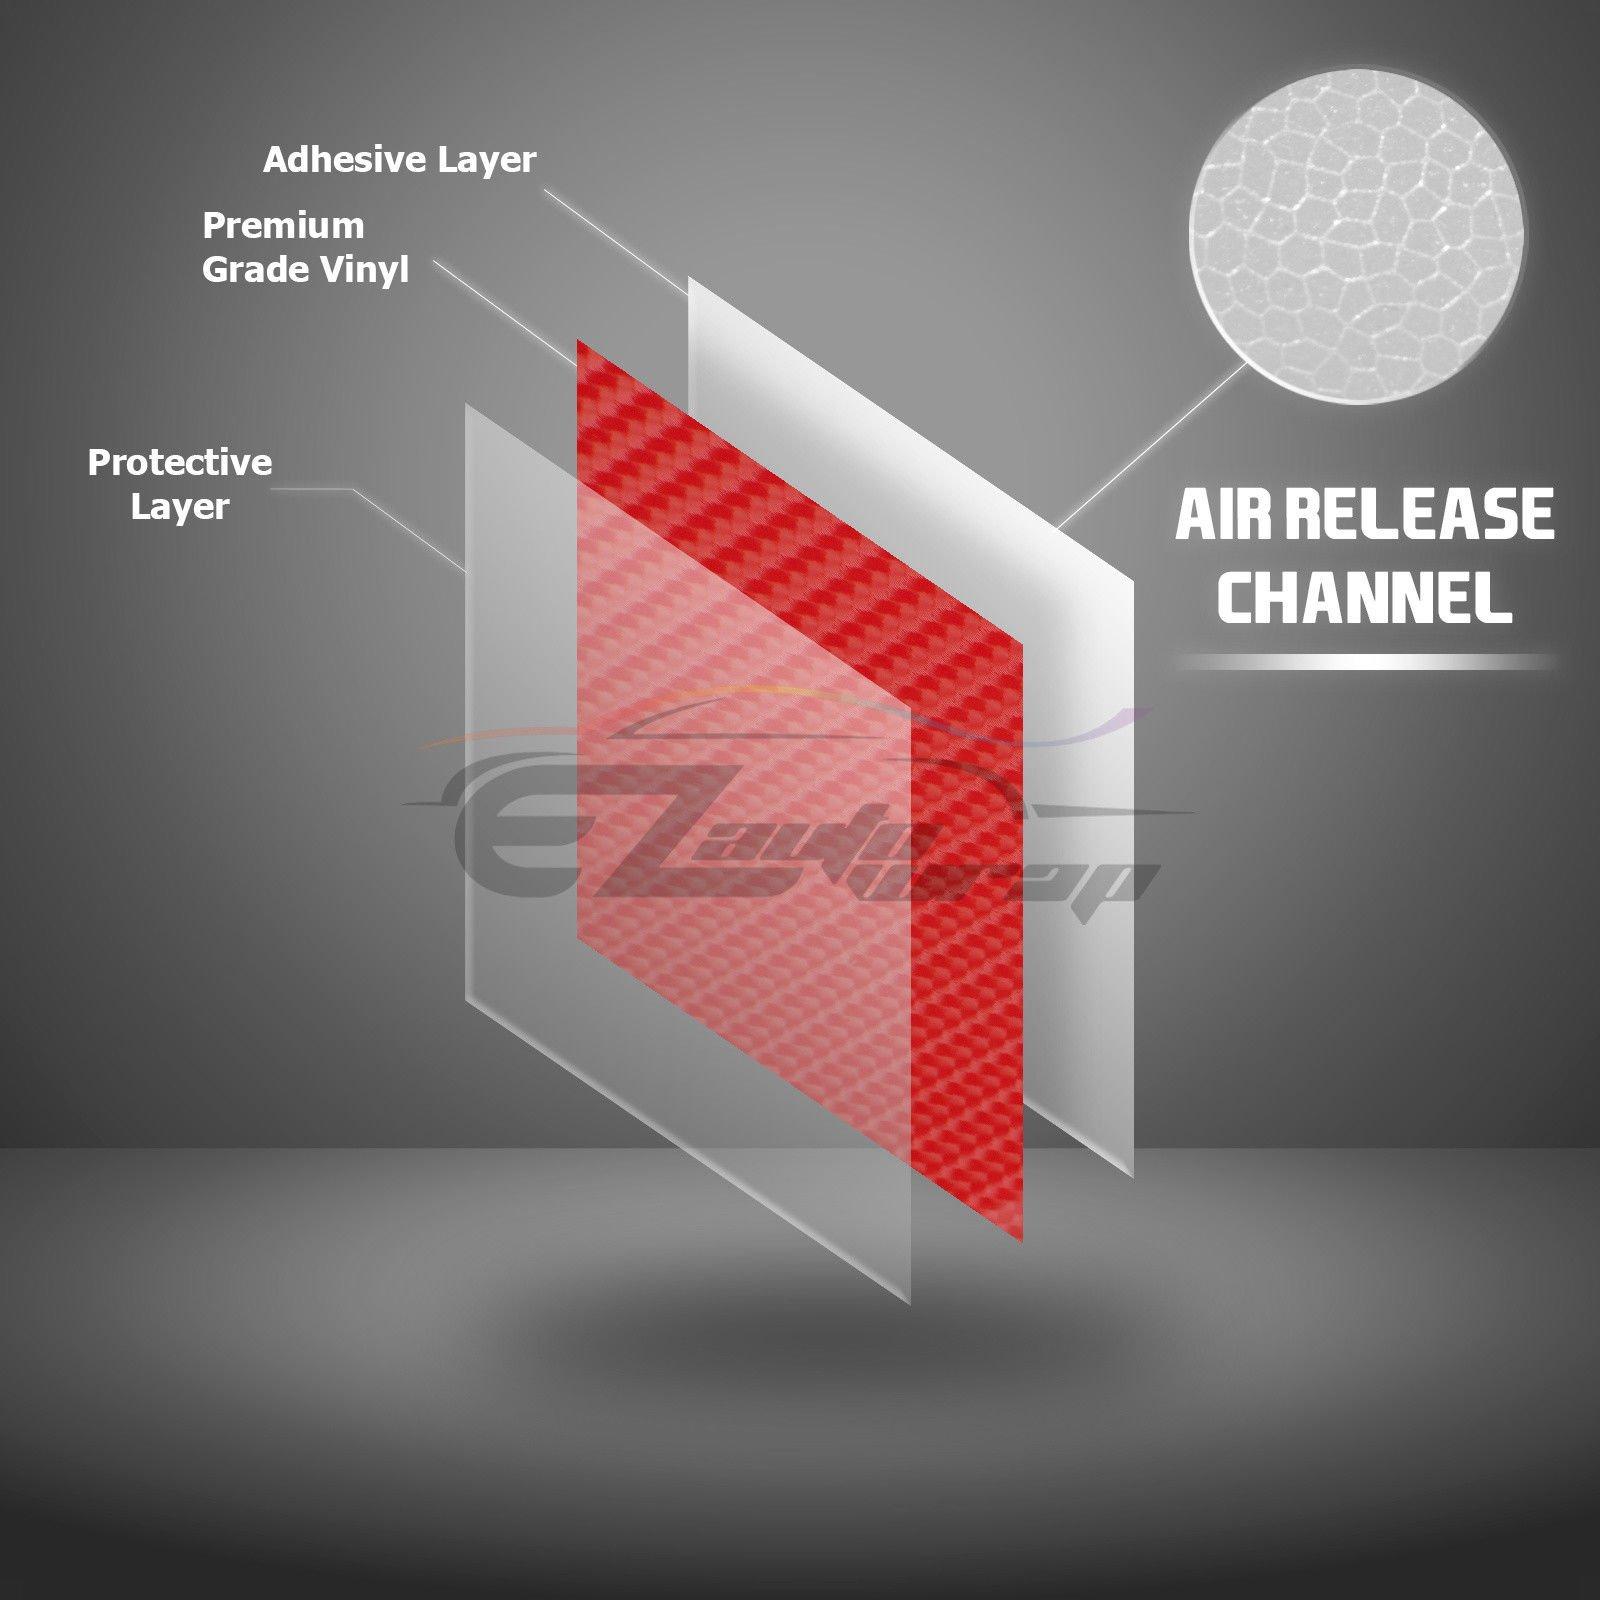 EZAUTOWRAP Free Tool Kit Premium Orange 7D Carbon Fiber High Gloss Car Vinyl Wrap Sticker Decal Film Sheet Bubble Free Air Release Technology 6D 1FT X 5FT 12X60